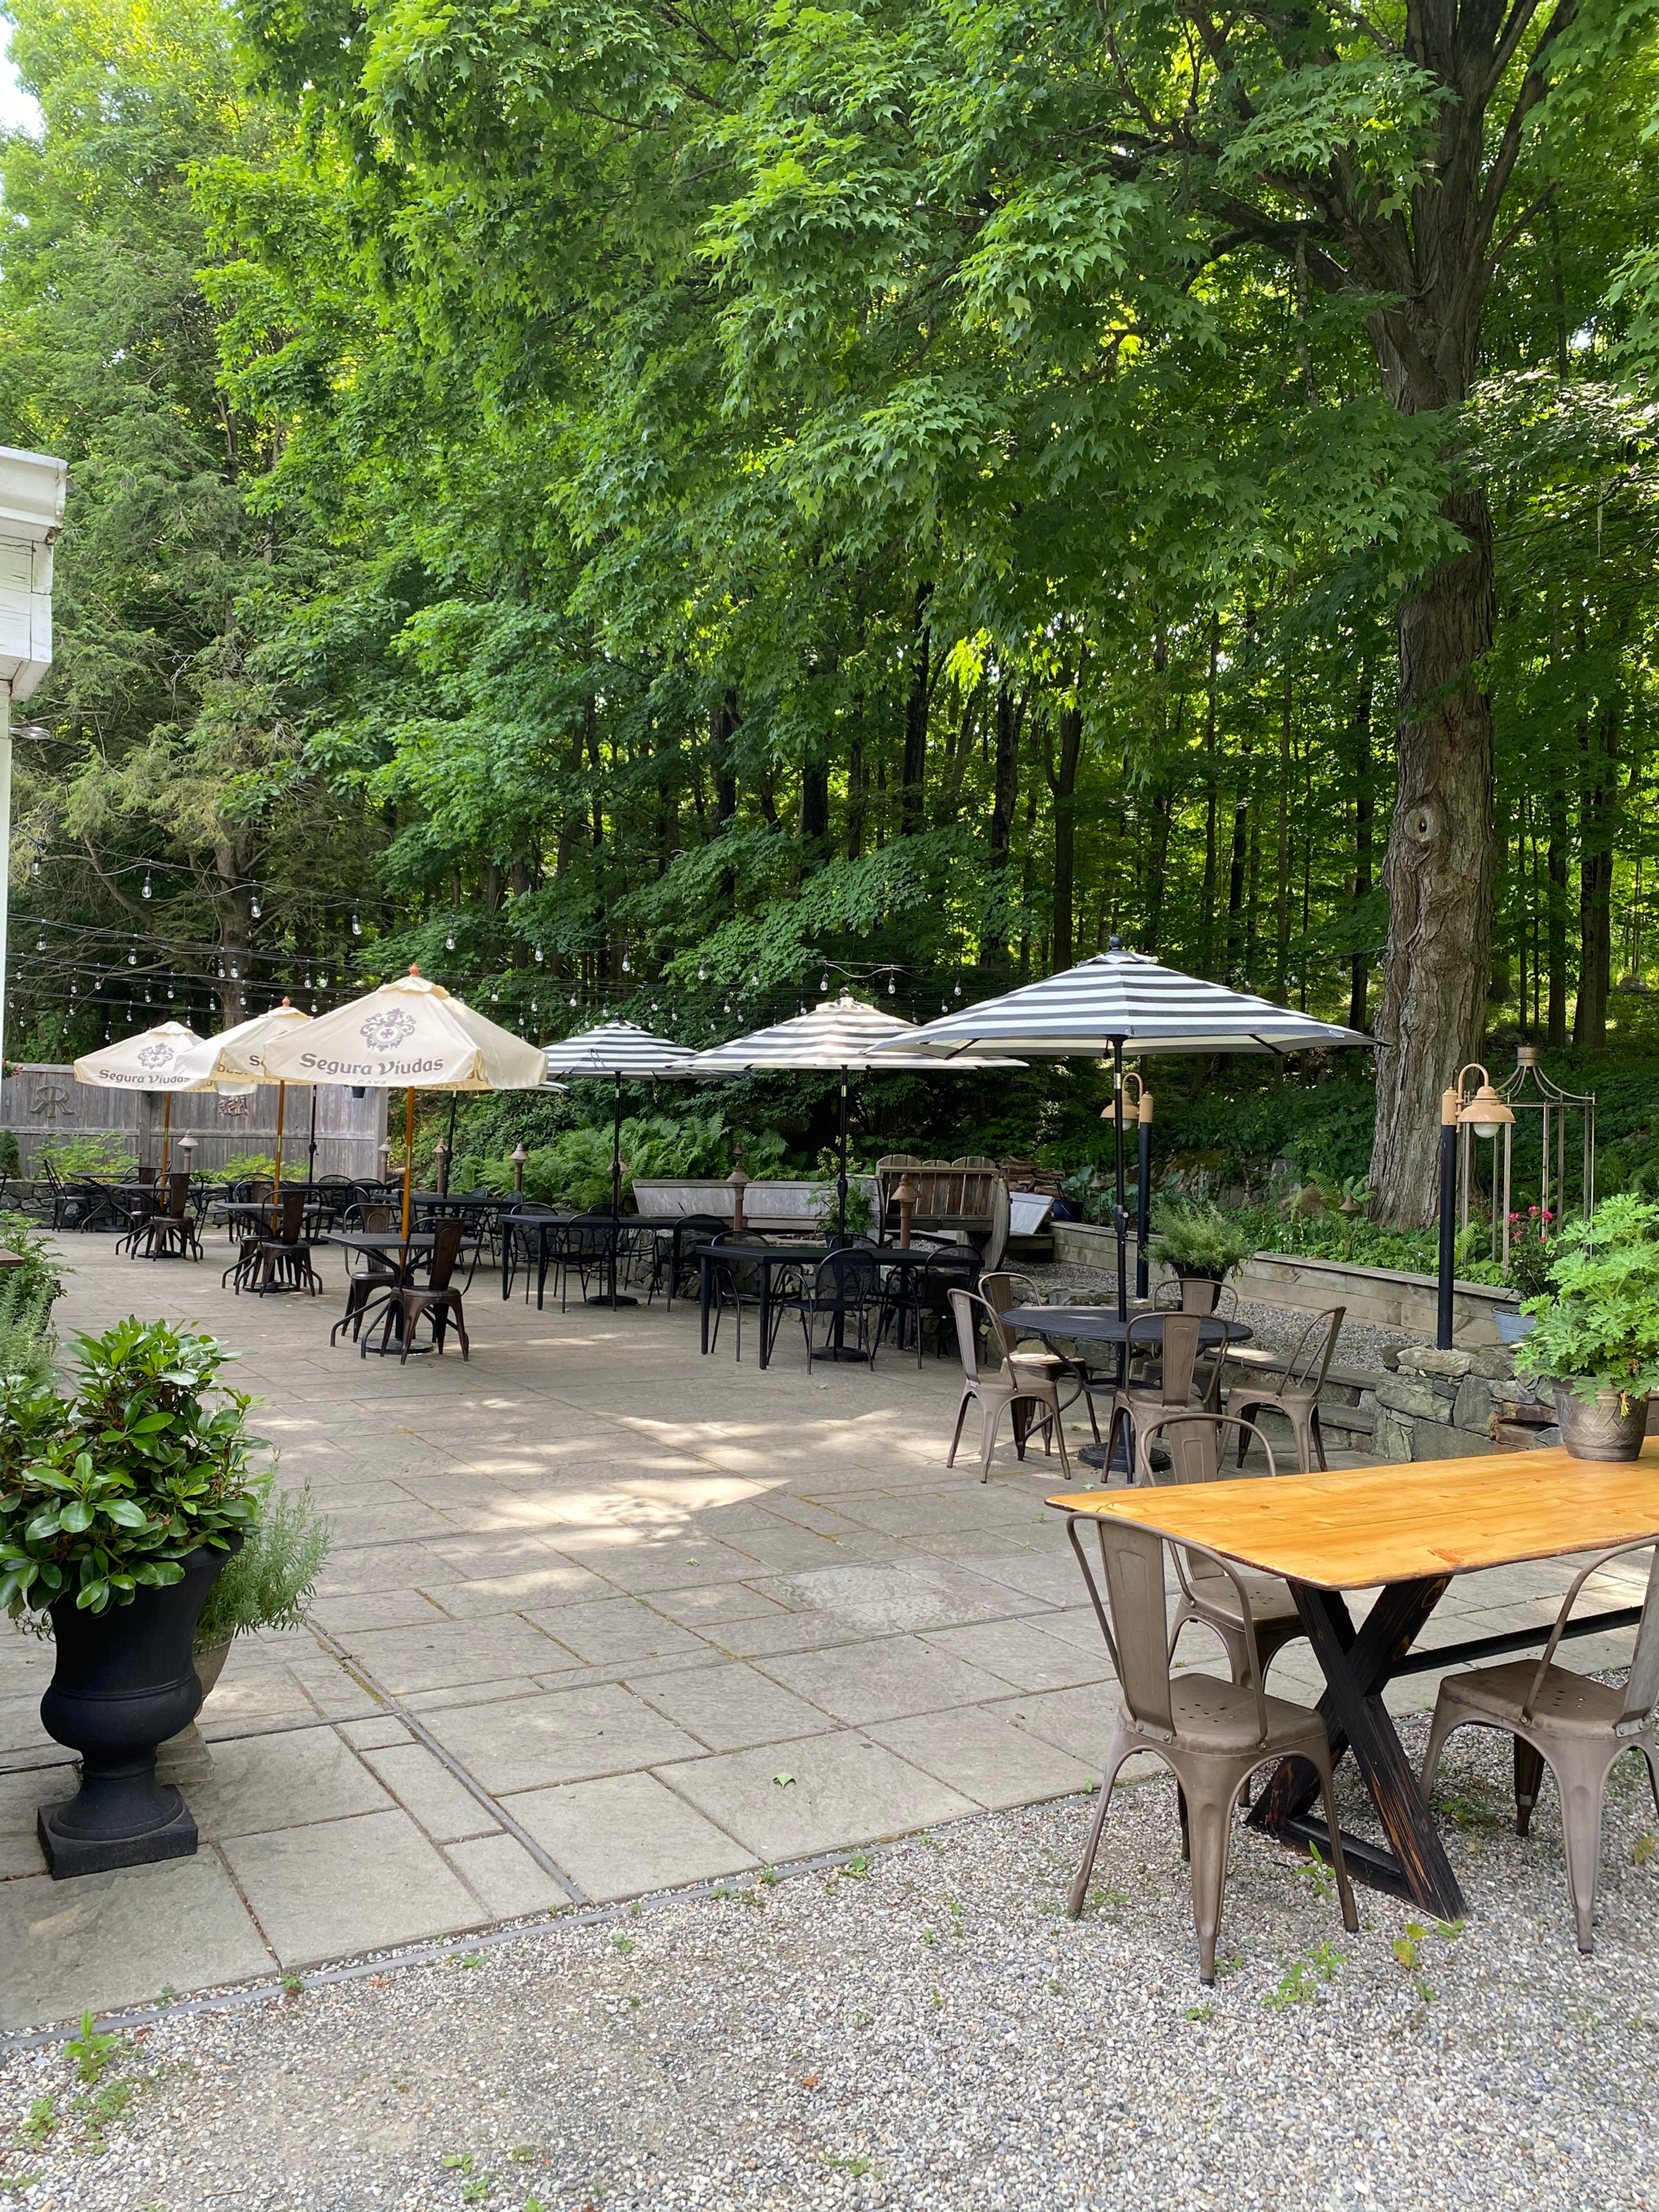 The Outdoor Patio - Private Event Venue